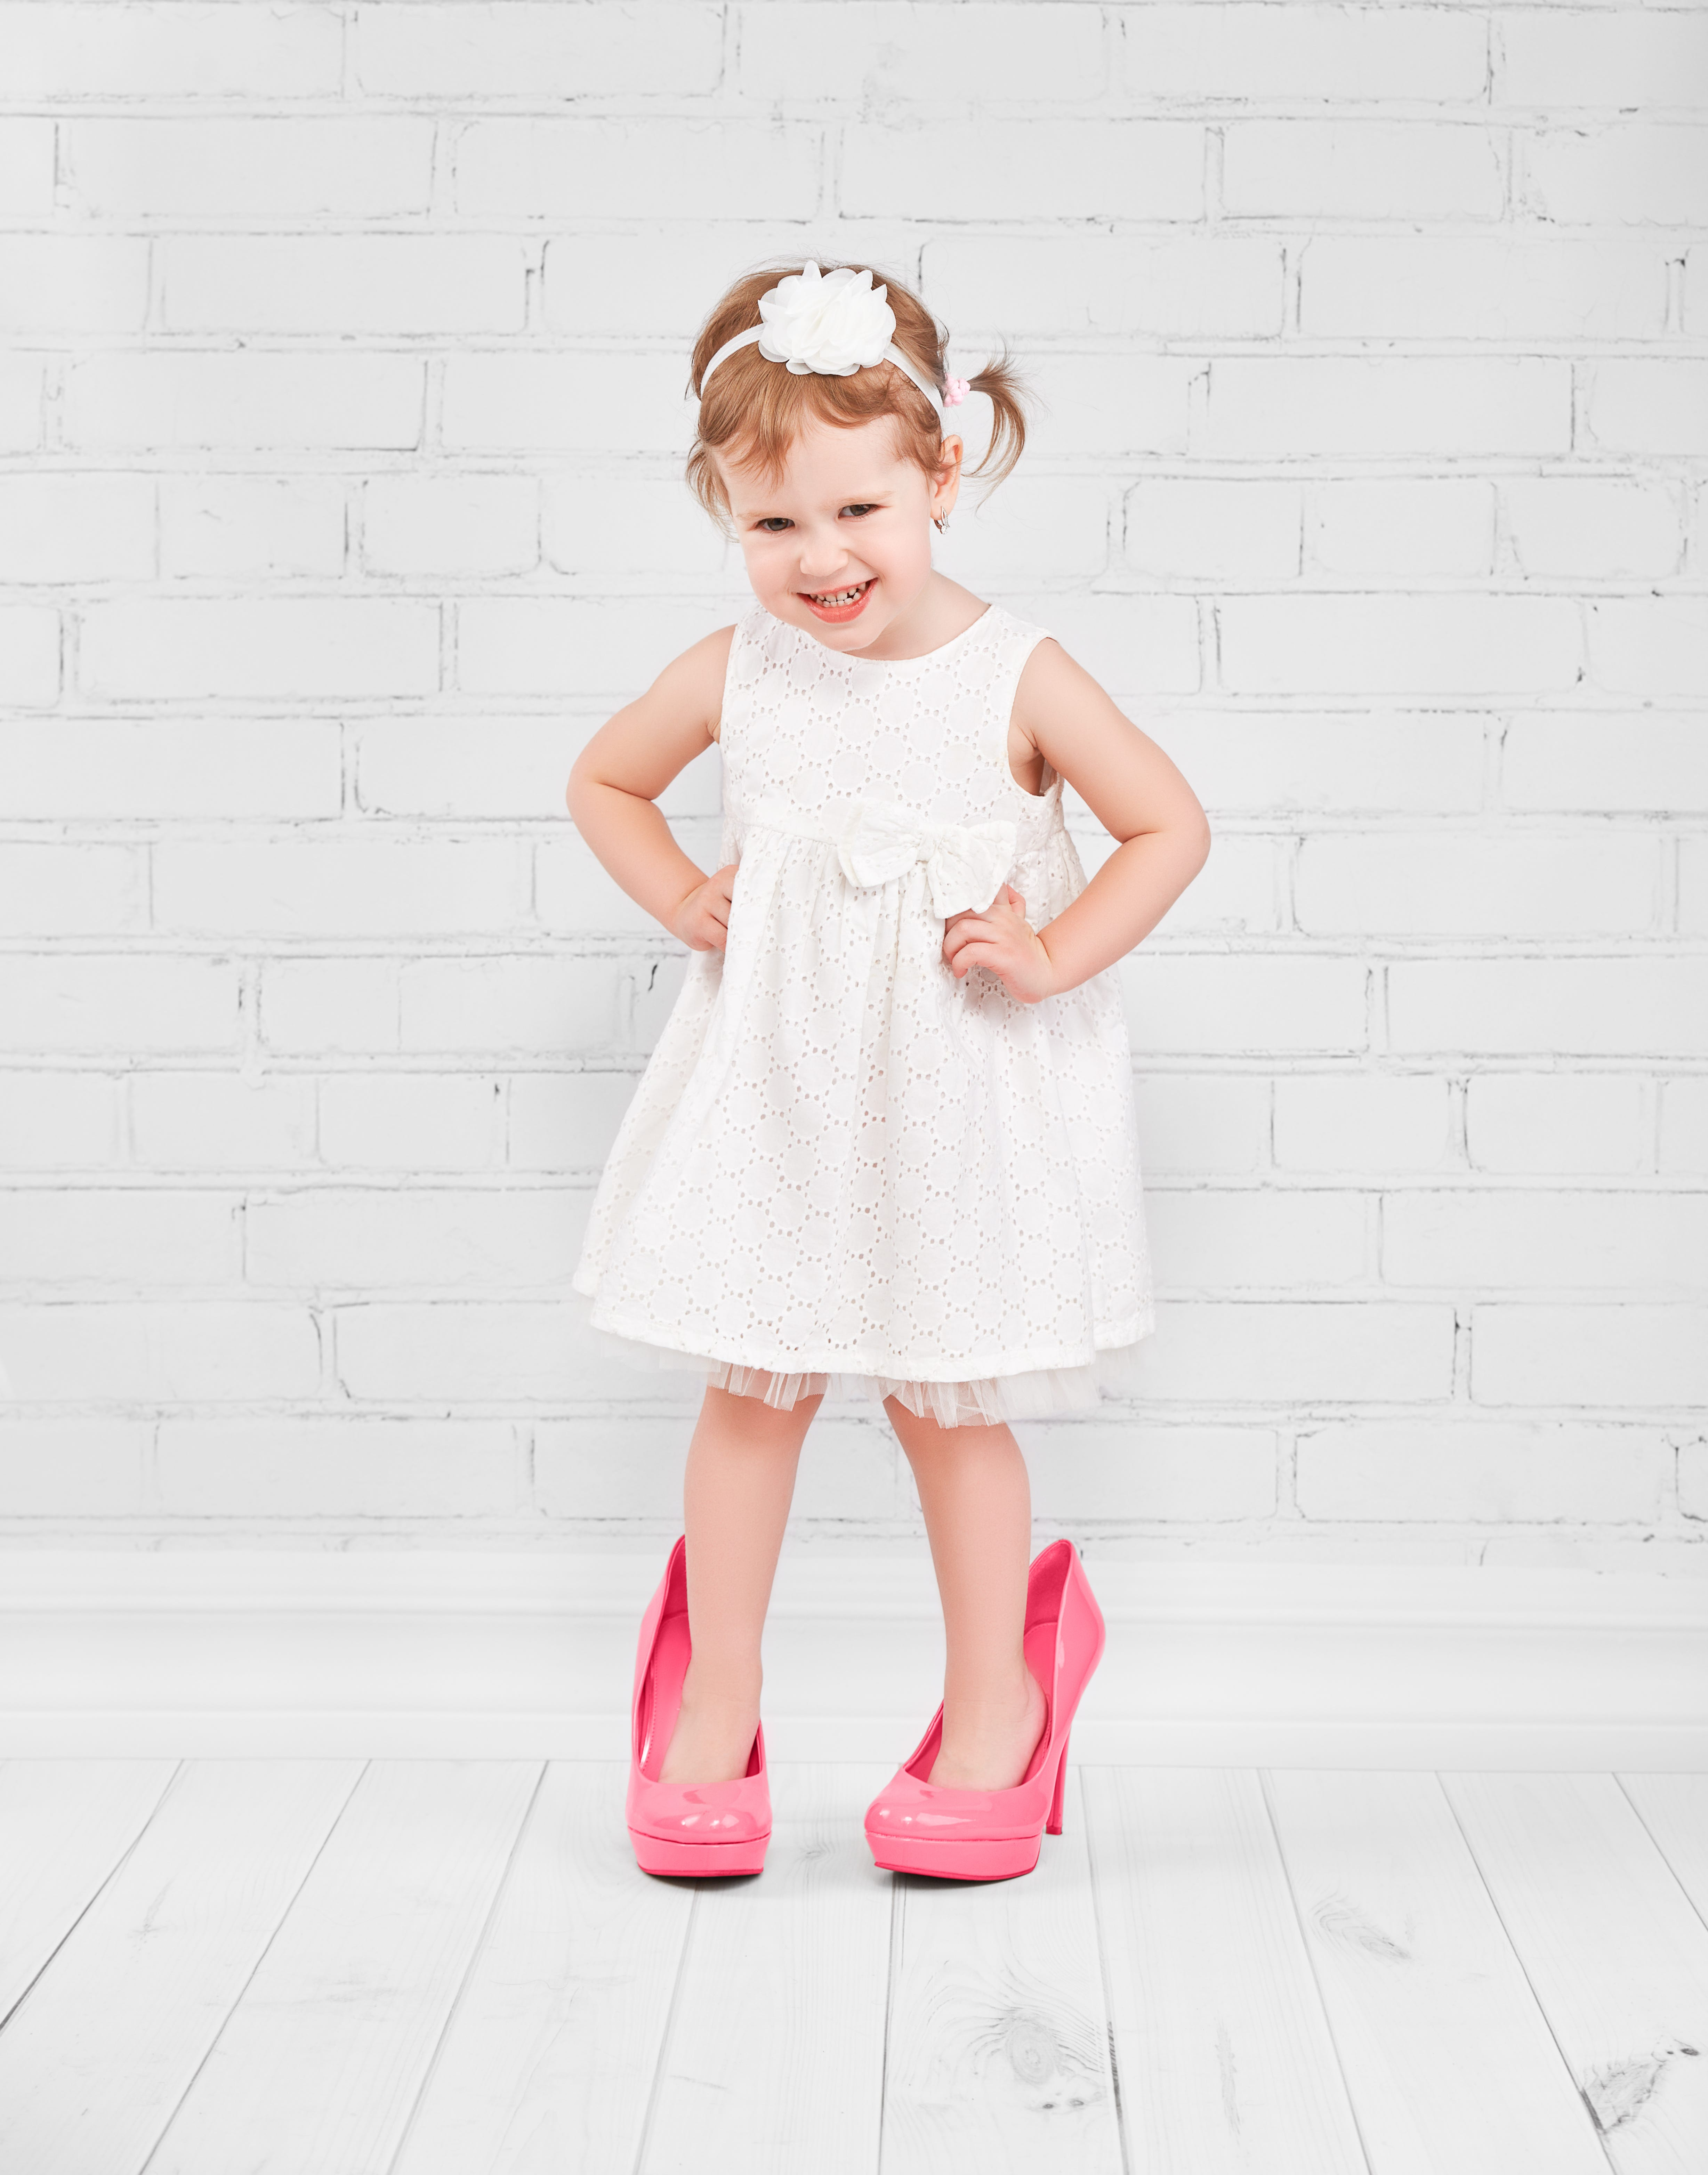 wants your baby in high heels